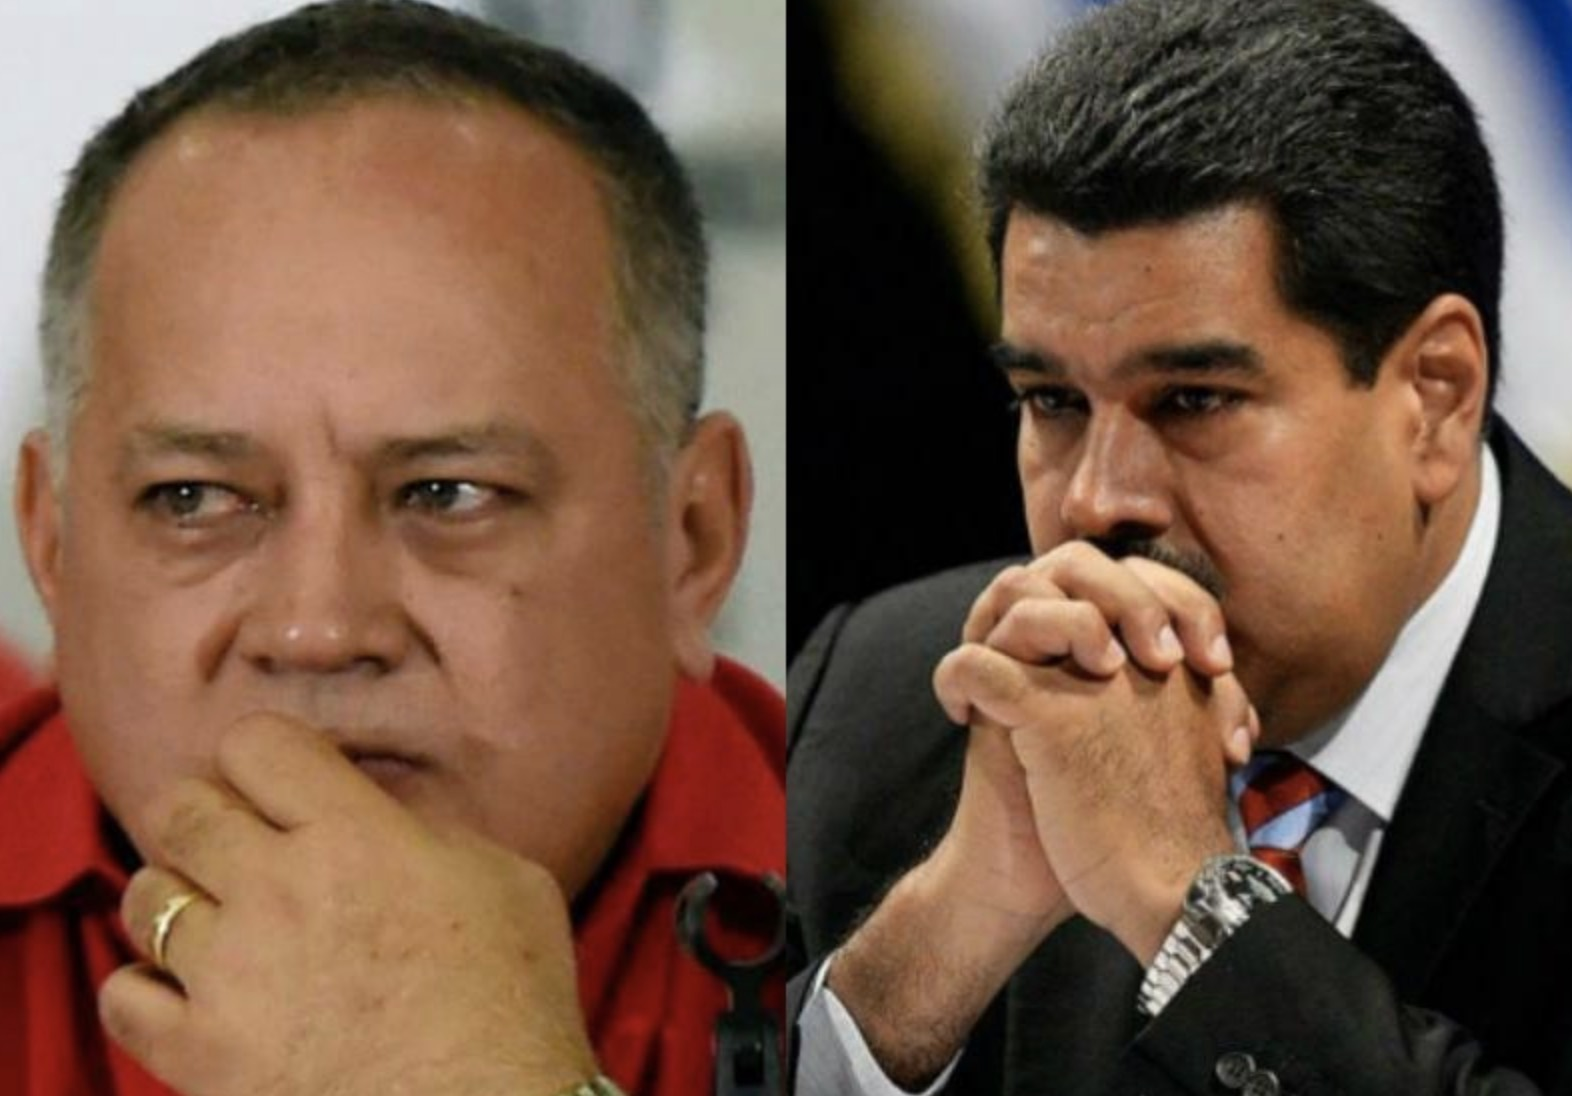 Diosdado Cabello, Nicolás Maduro, Narcoterrorismo, Terrorismo internacional